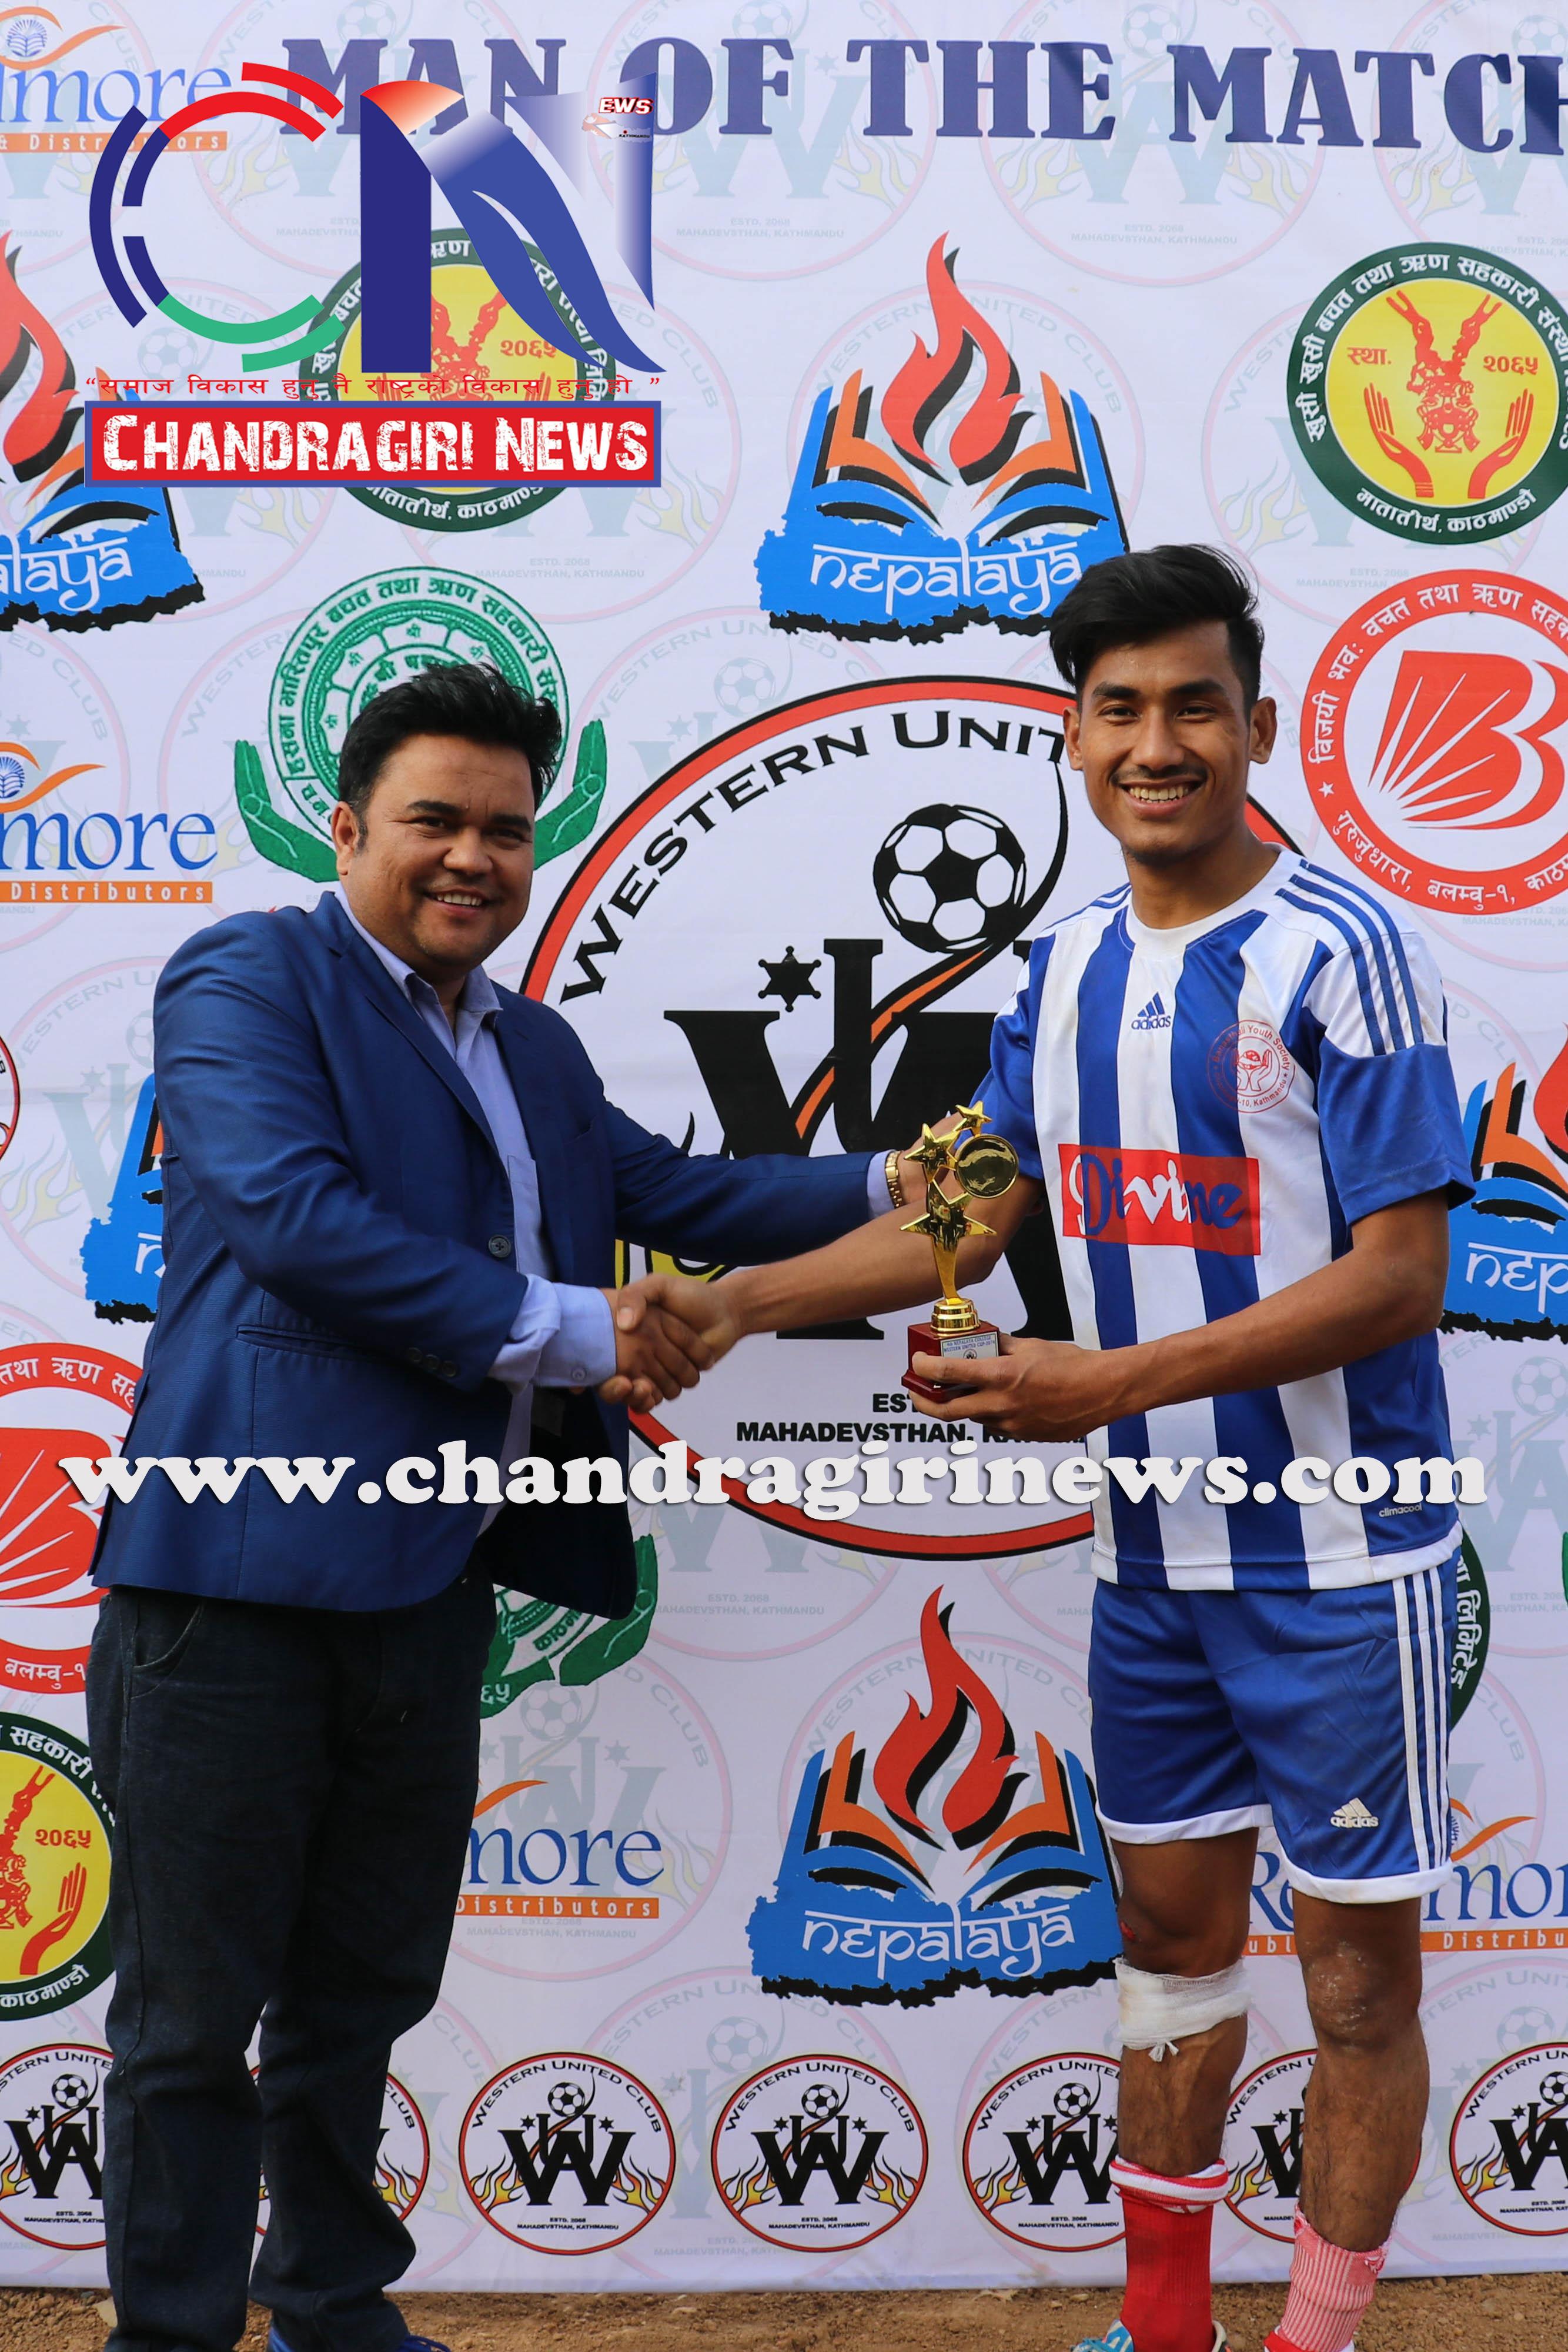 Chandragirinews western-united-first-game-13 चाैठाै  नेपाललय वईस्टन युनाईटेड क्लव फुटबल प्रतियाेगिता सुरू काठमाडौं किसीपिँडी खेलकुद थानकोट ब्रेकिंग न्युज महादेव स्थान मातातिर्थ मुख्य    chandragiri